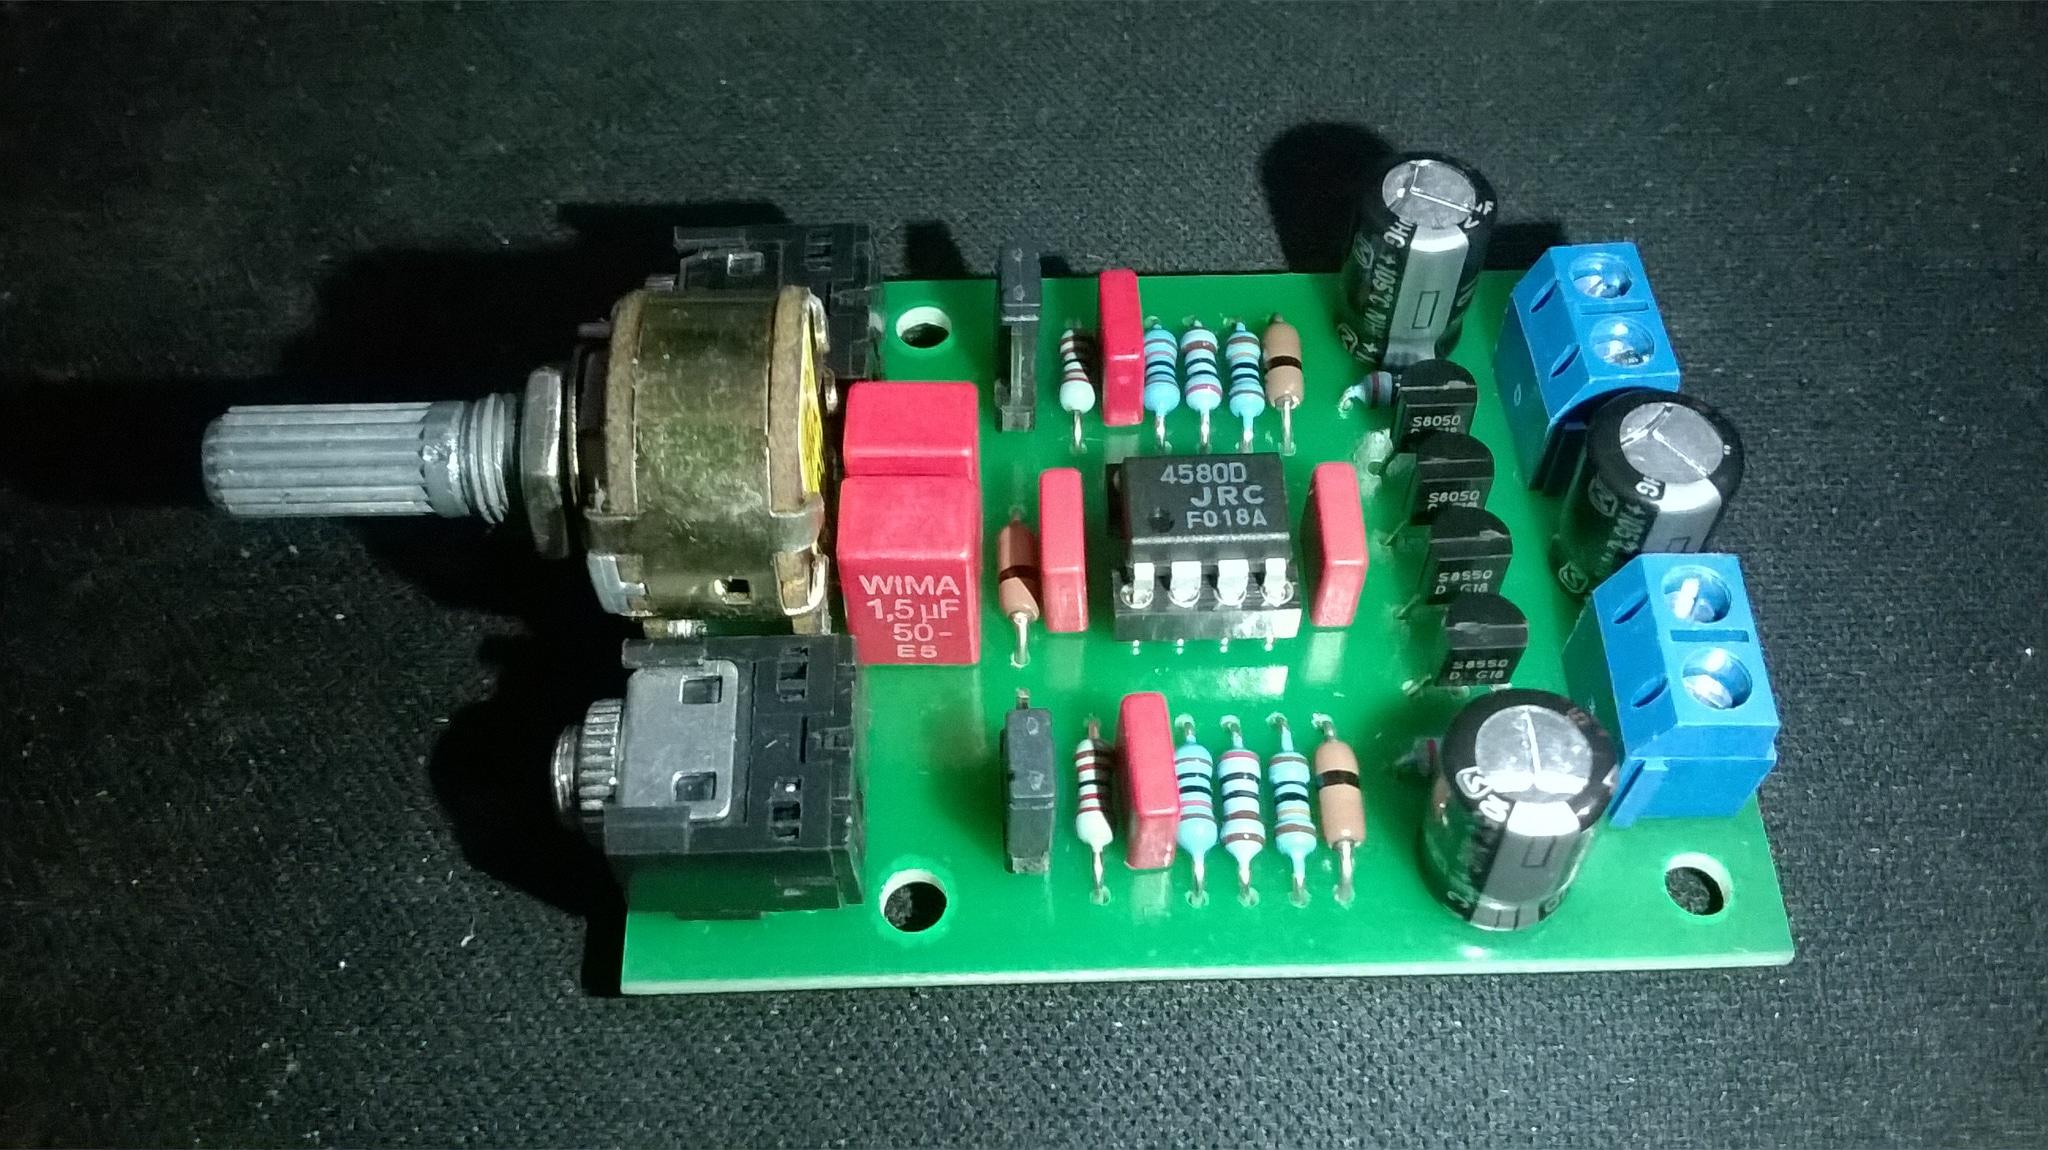 Jual Kit Cmoy Head Amp Headphones Amplifier 100mhz Elektronik Headphone Tokopedia